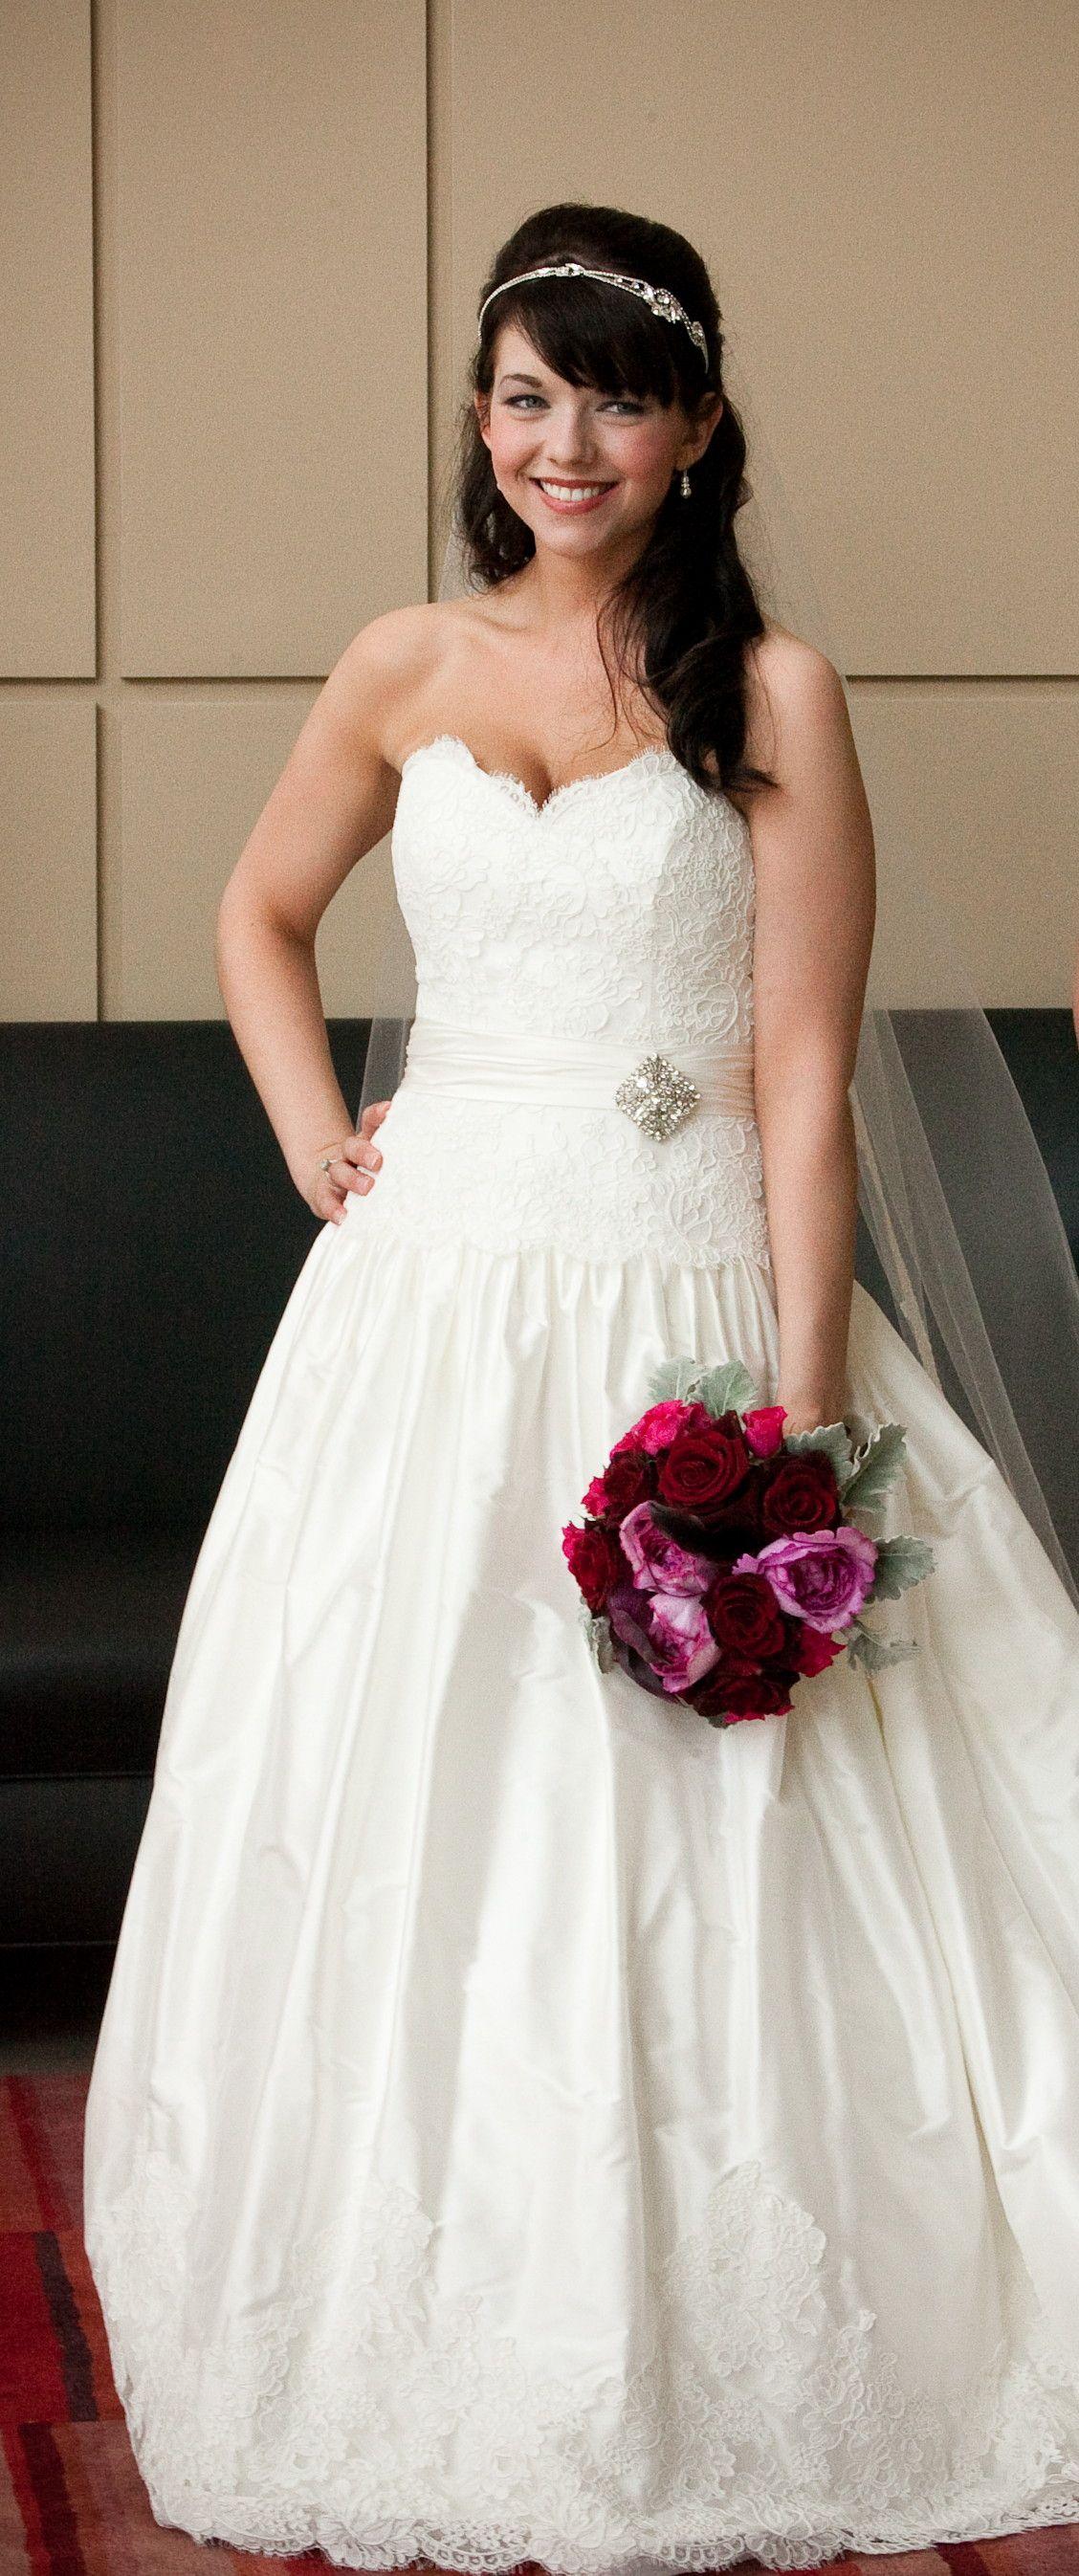 wedding hair - half up with headband and veil | wedding ideas ...